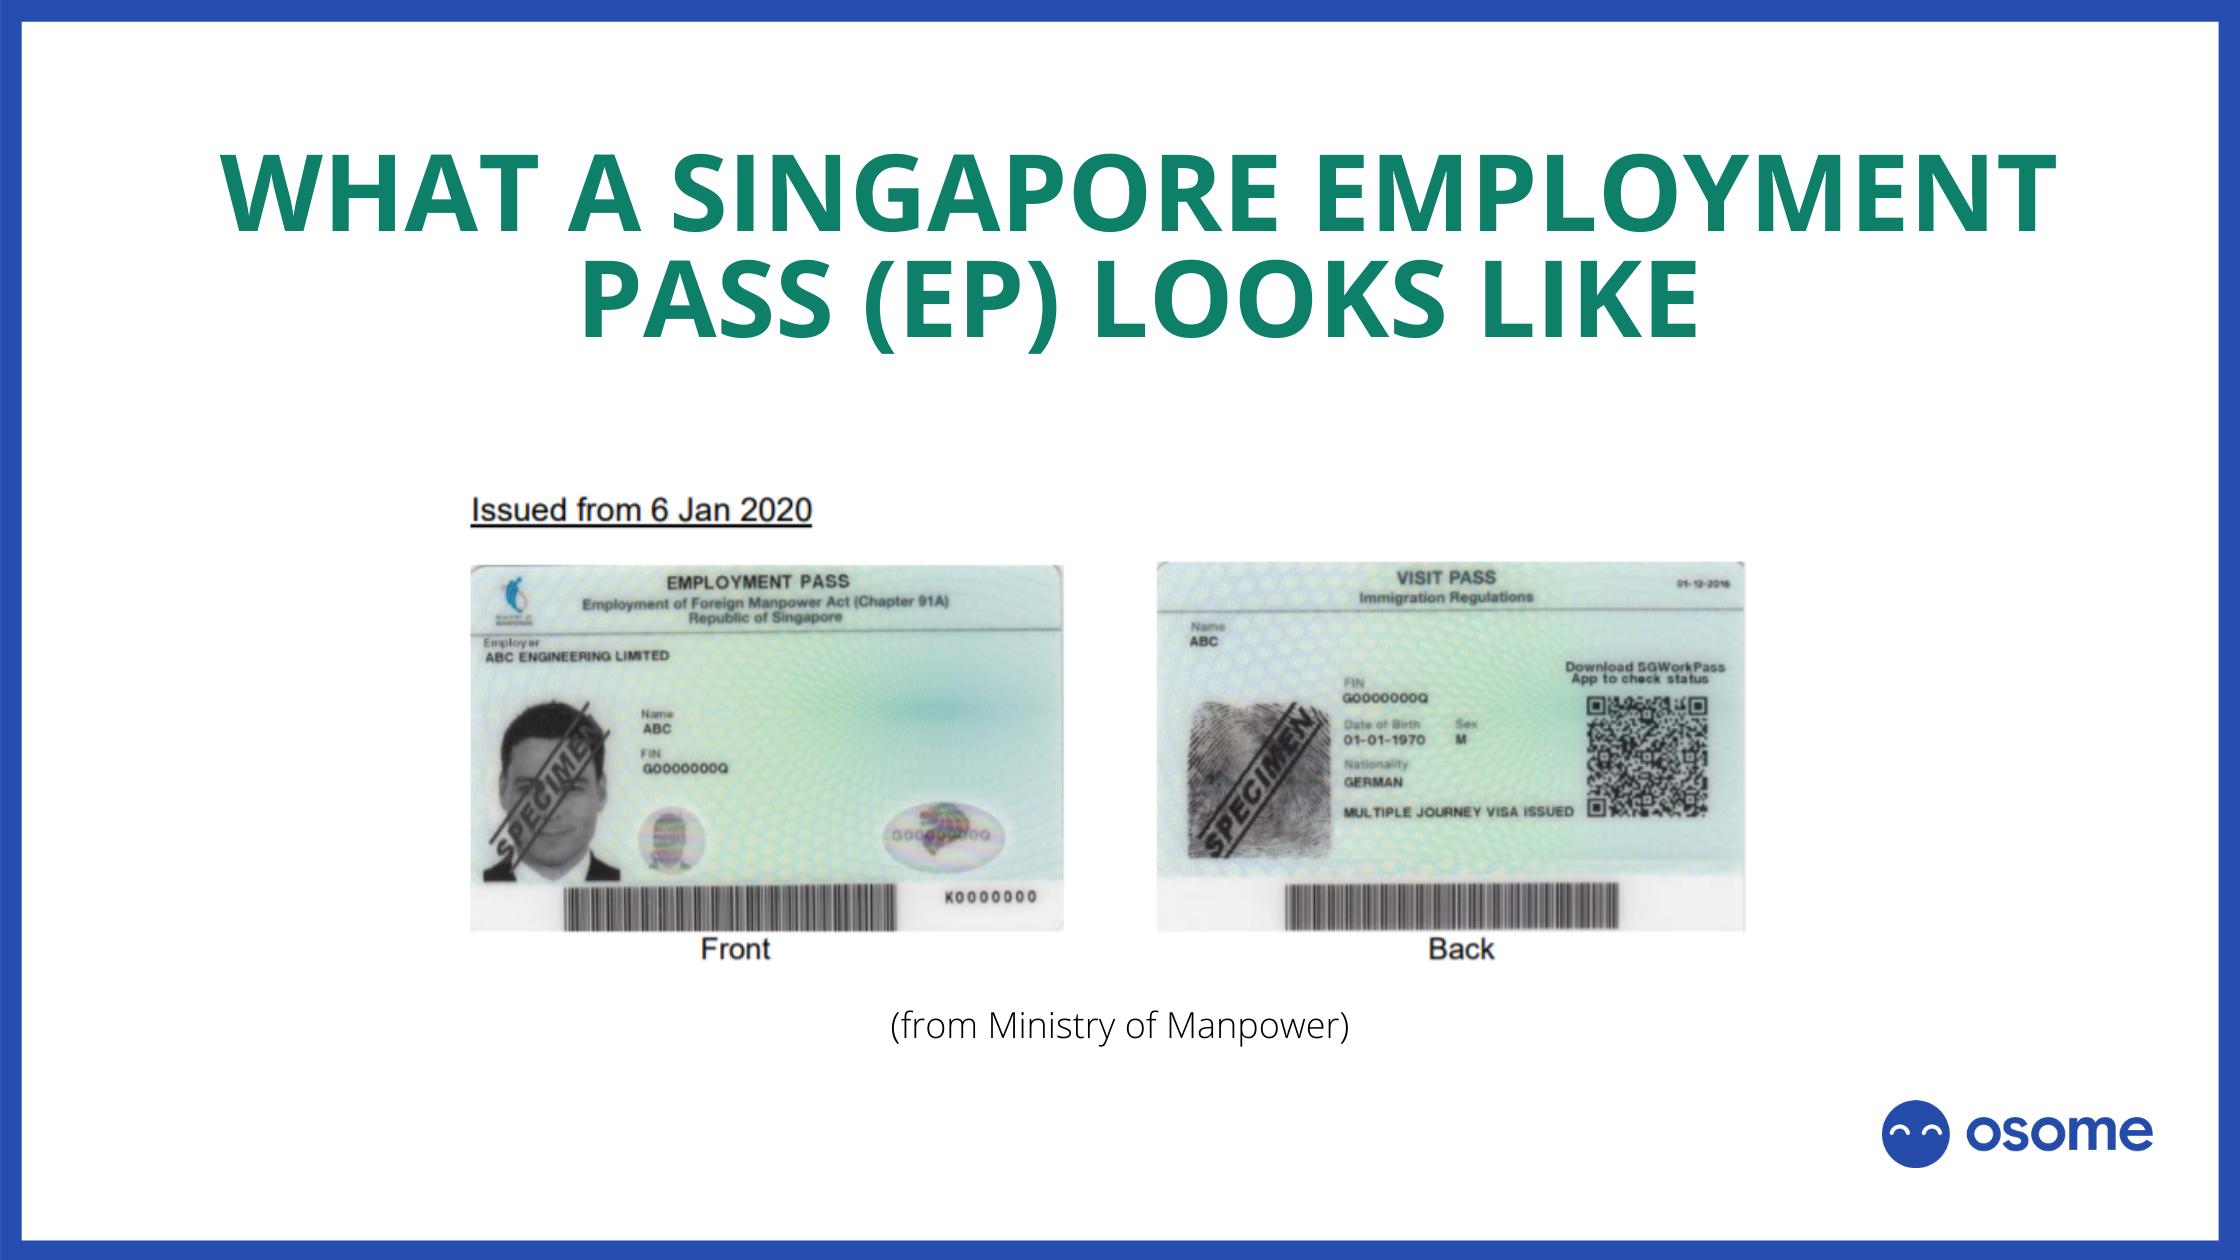 Example singapore employment pass EP 2021